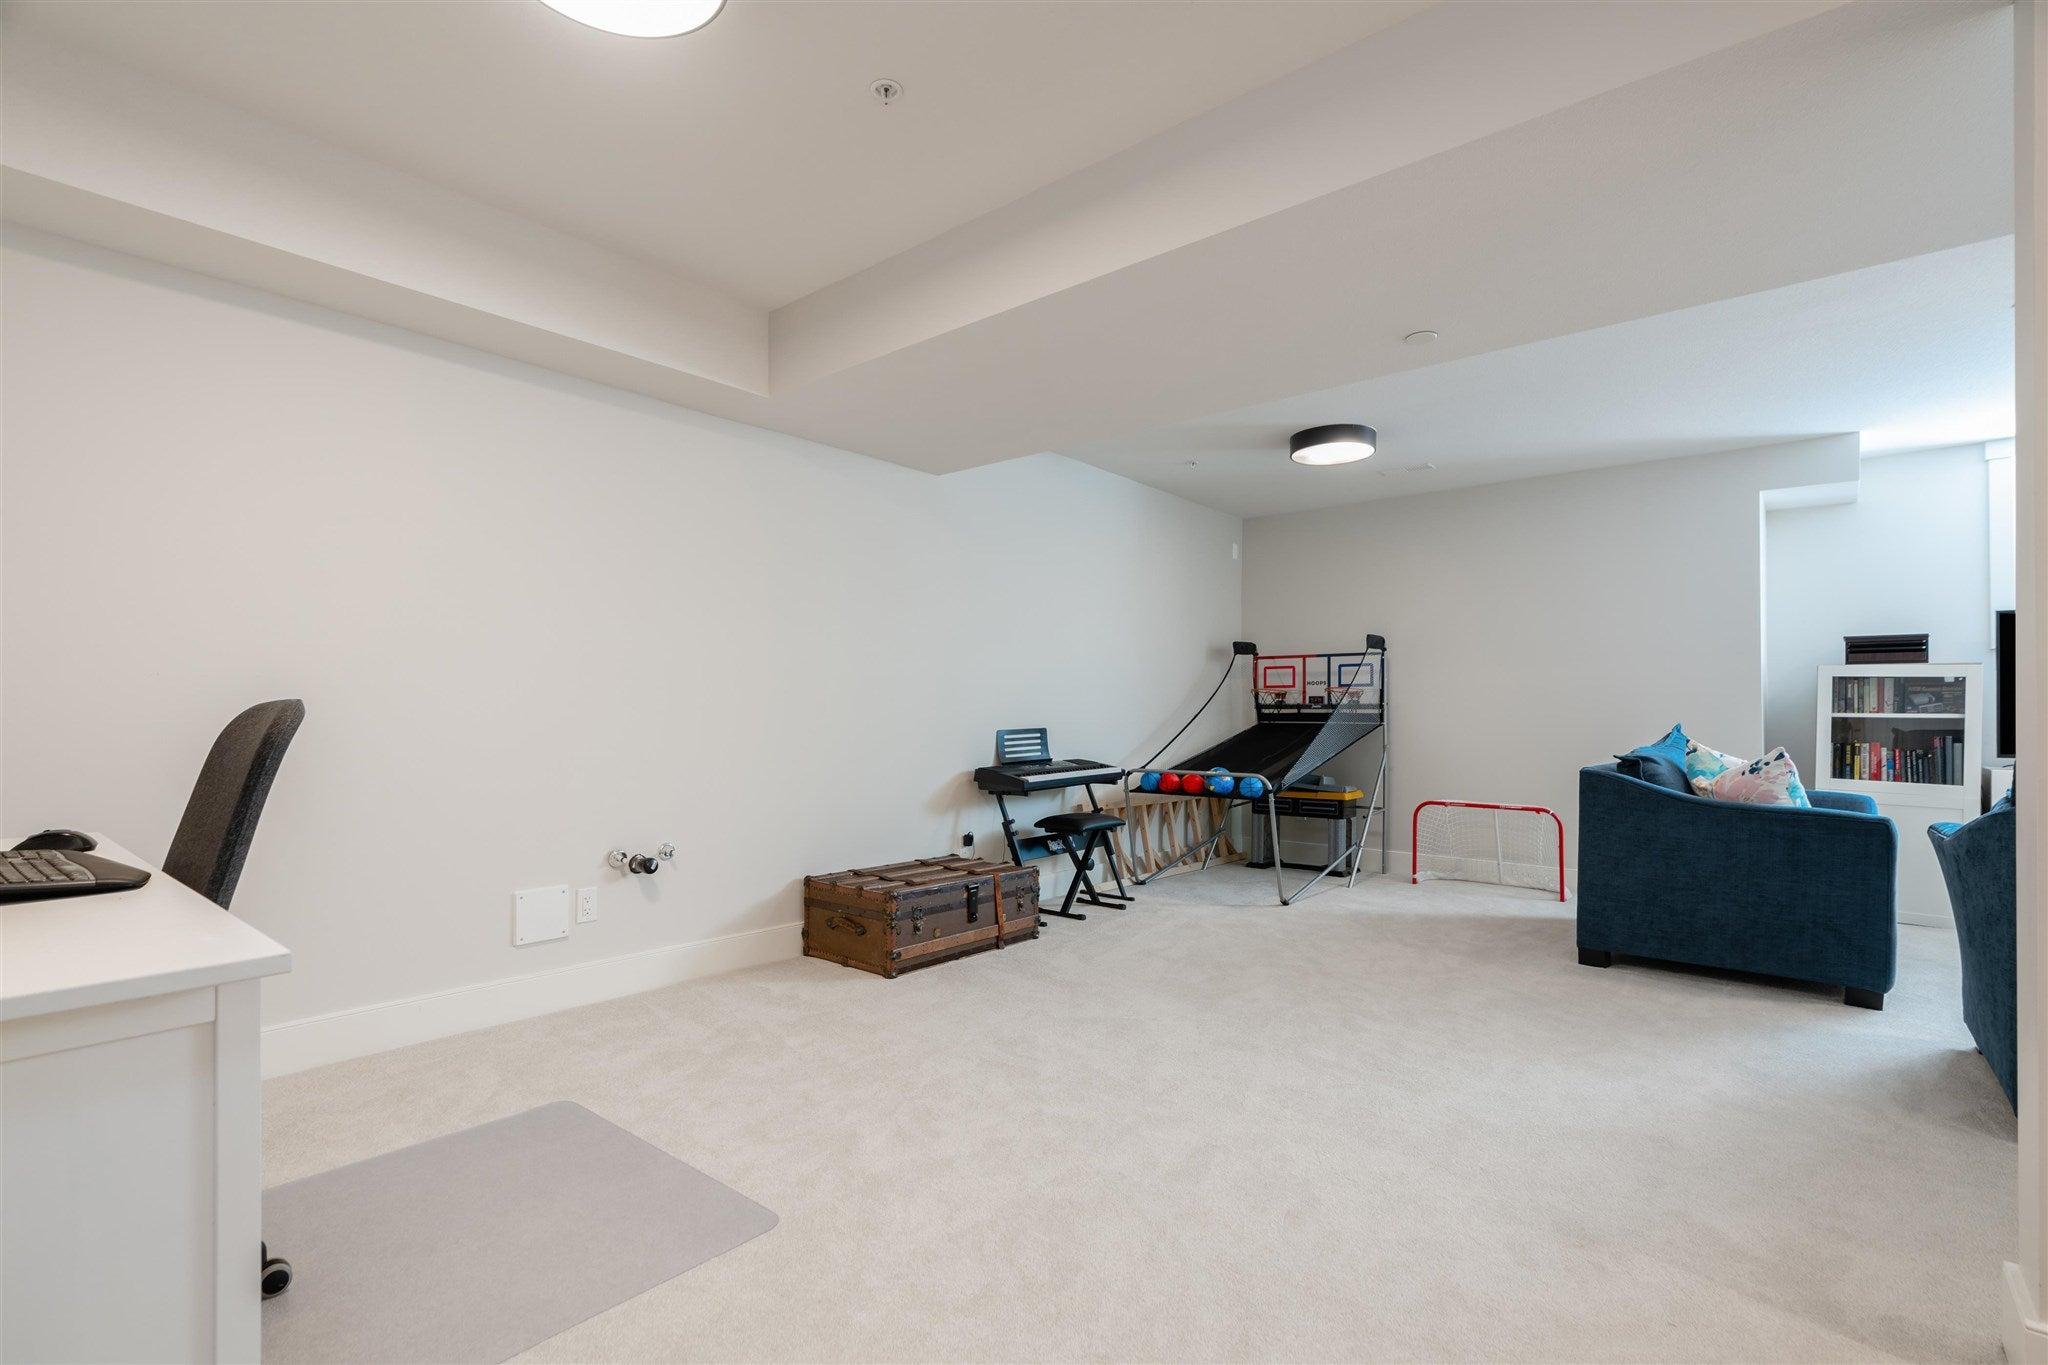 40 21858 47B AVENUE - Murrayville Townhouse for sale, 4 Bedrooms (R2603956) - #27